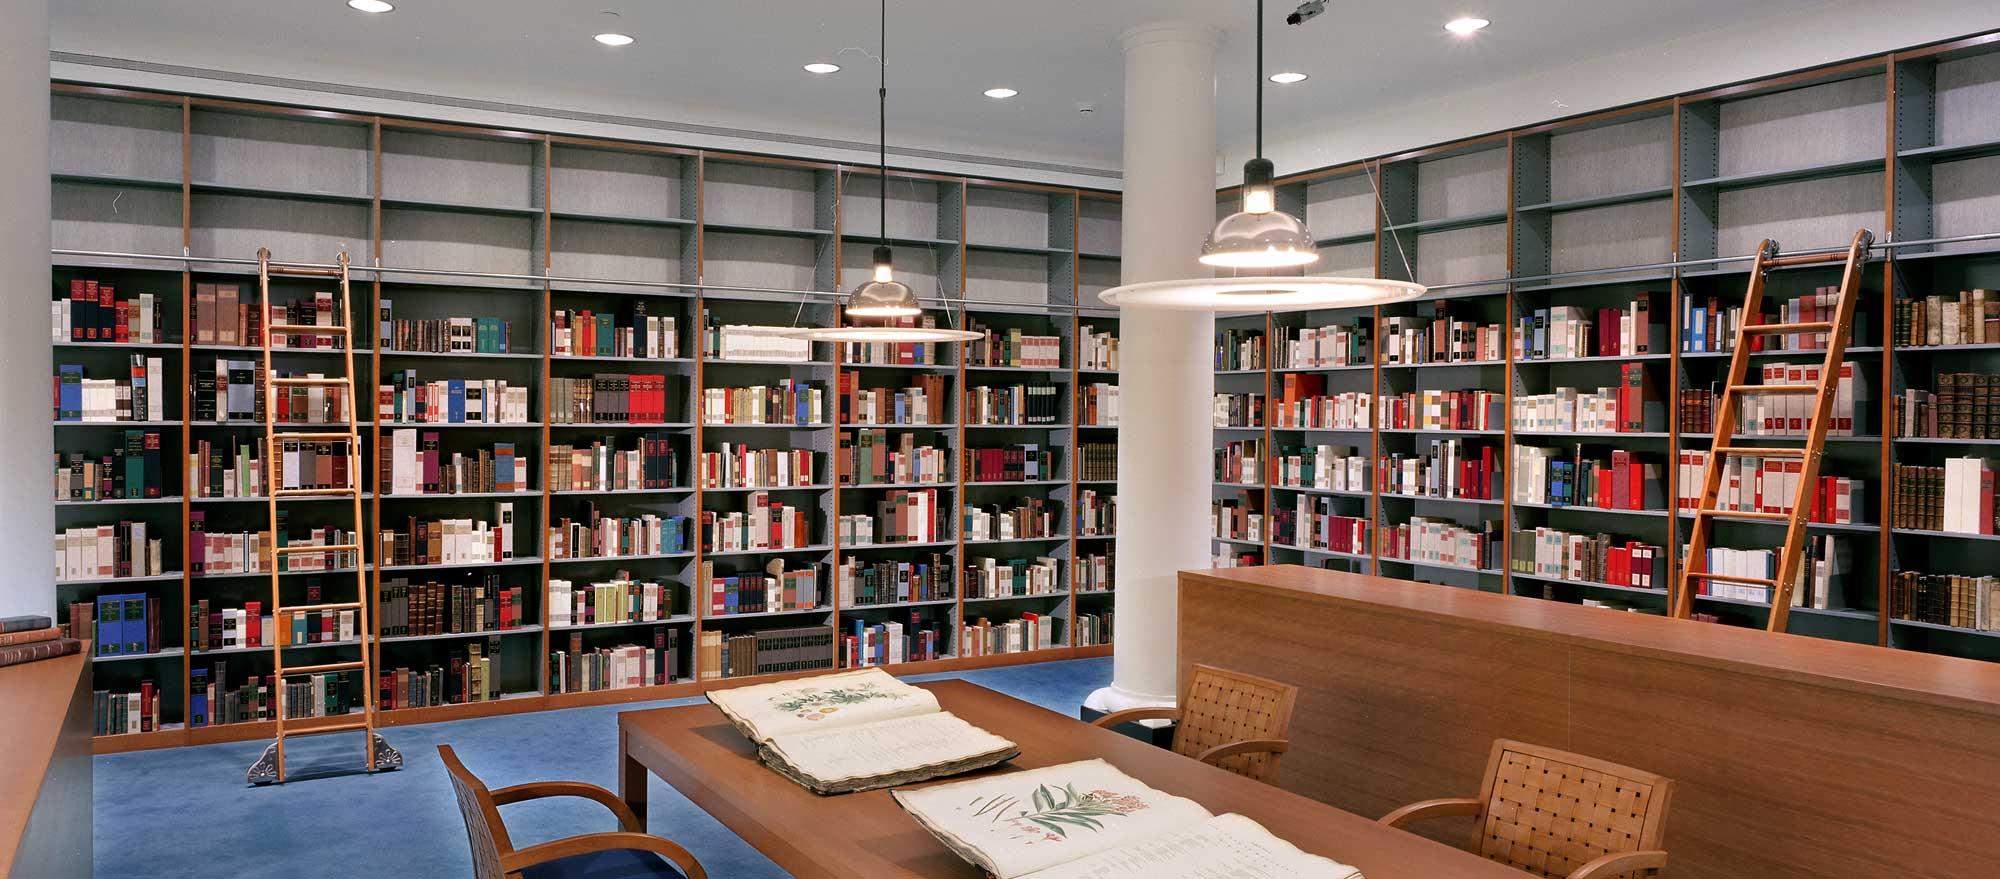 attic library ideas - Library Shelving Cantilever Book Shelves